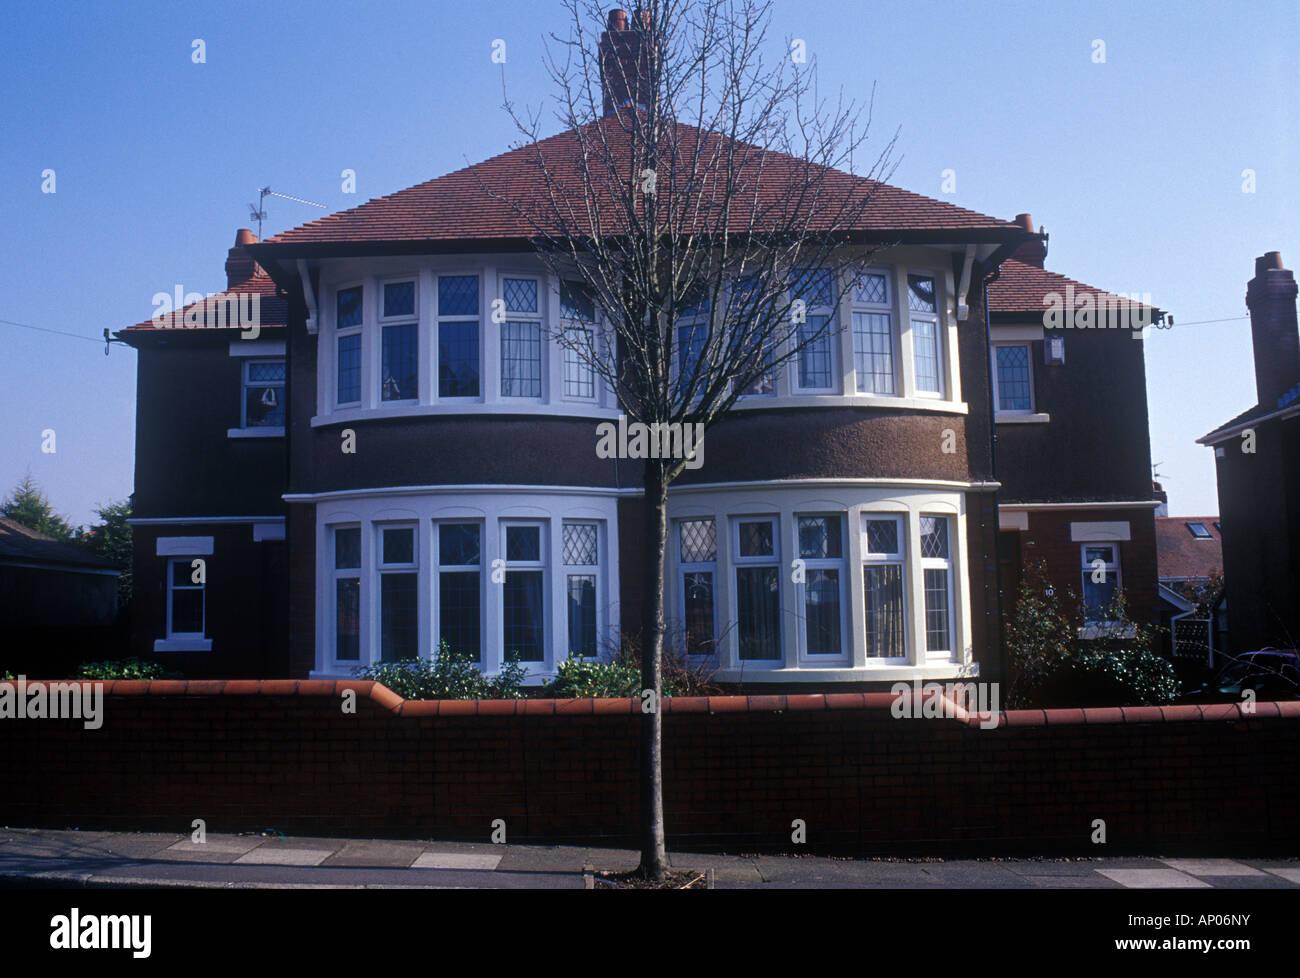 1920 houses styles uk